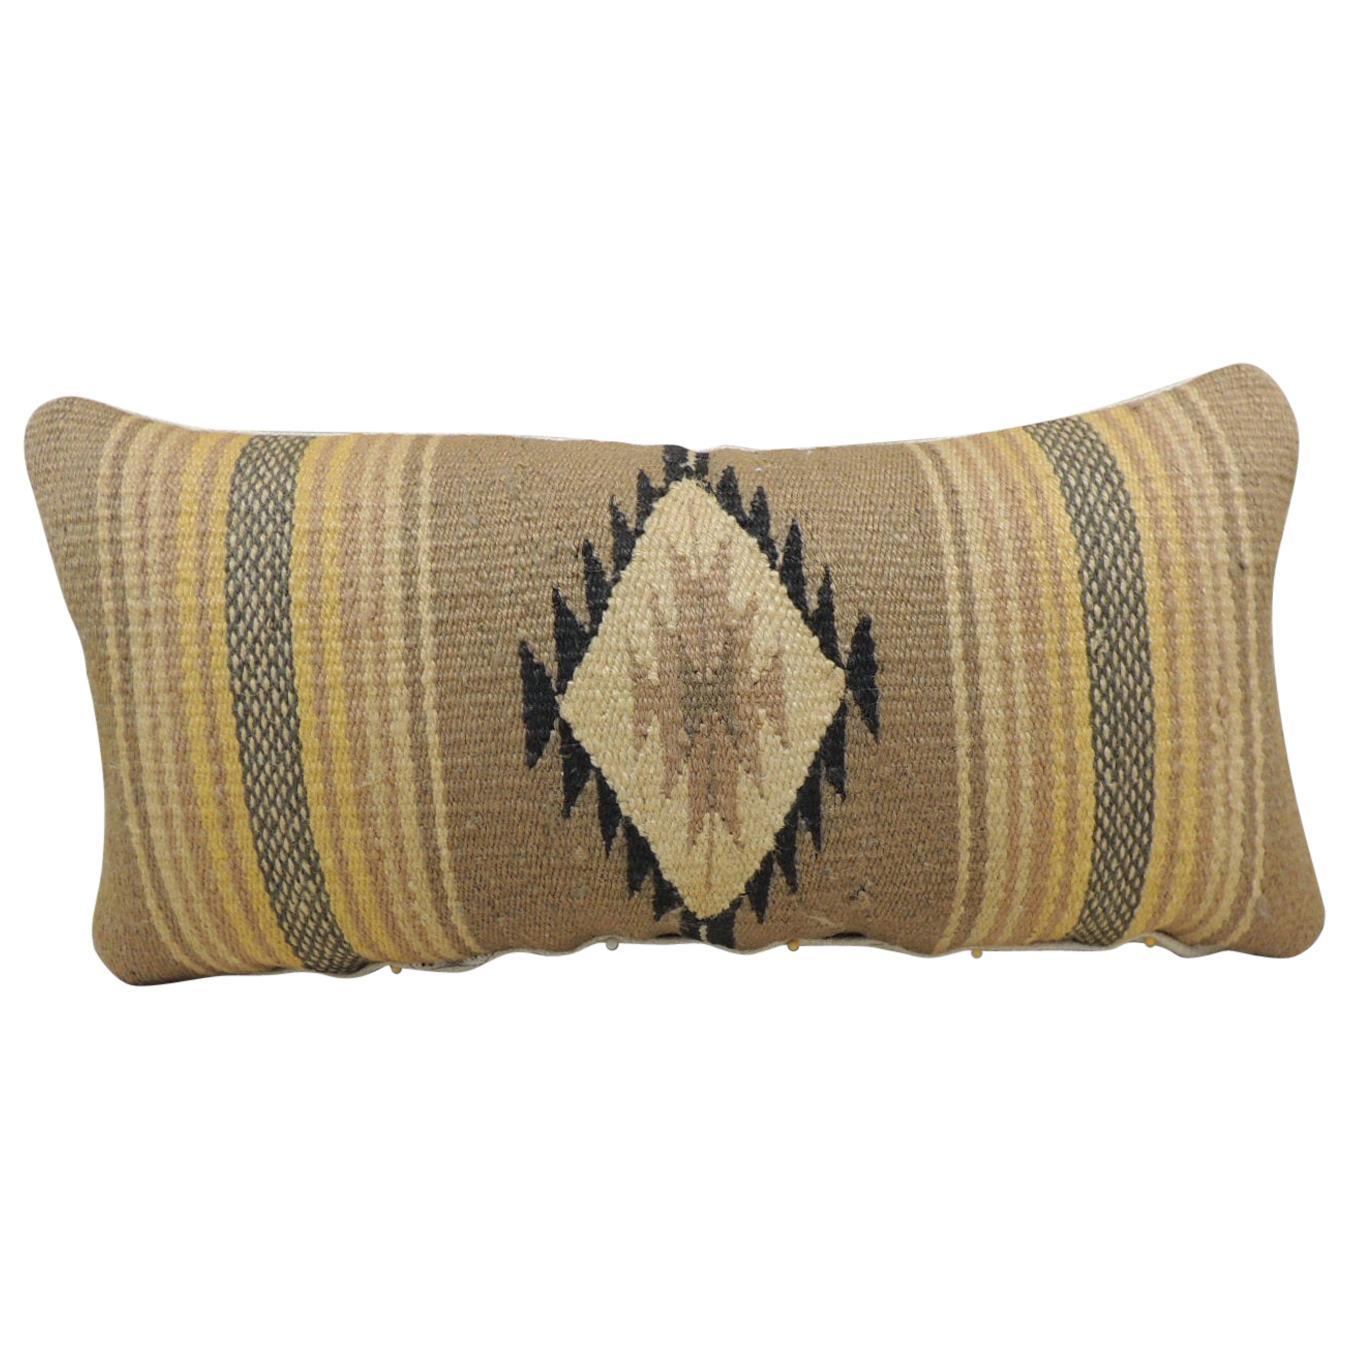 Vintage Yellow and Tan Navajo Style Woven Decorative Lumbar Pillow